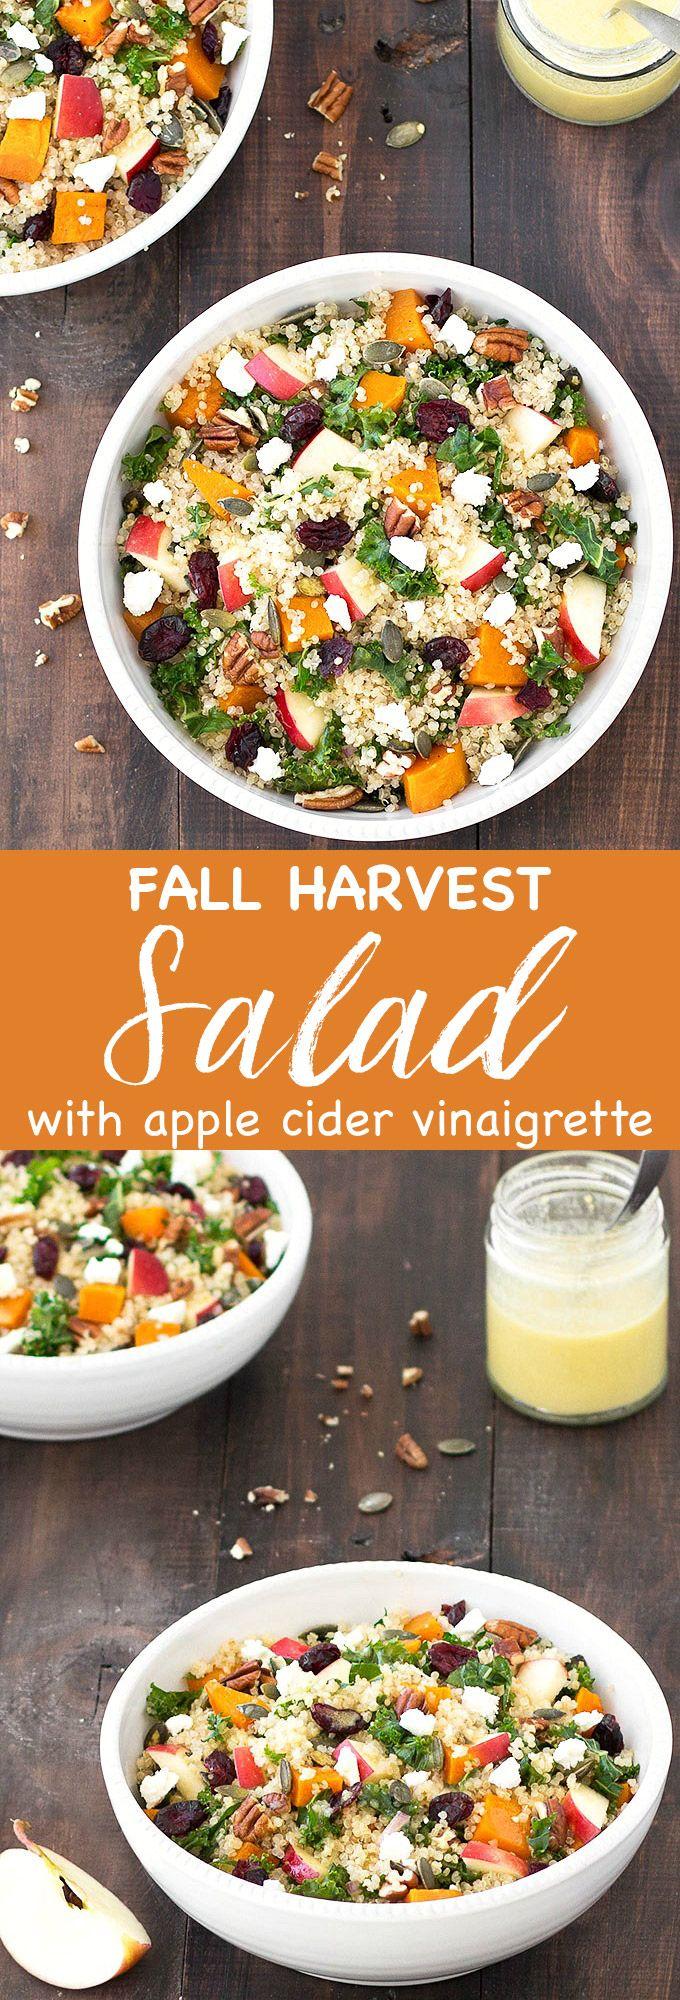 Photo of Fall Harvest Salad with Apple Cider Vinaigrette